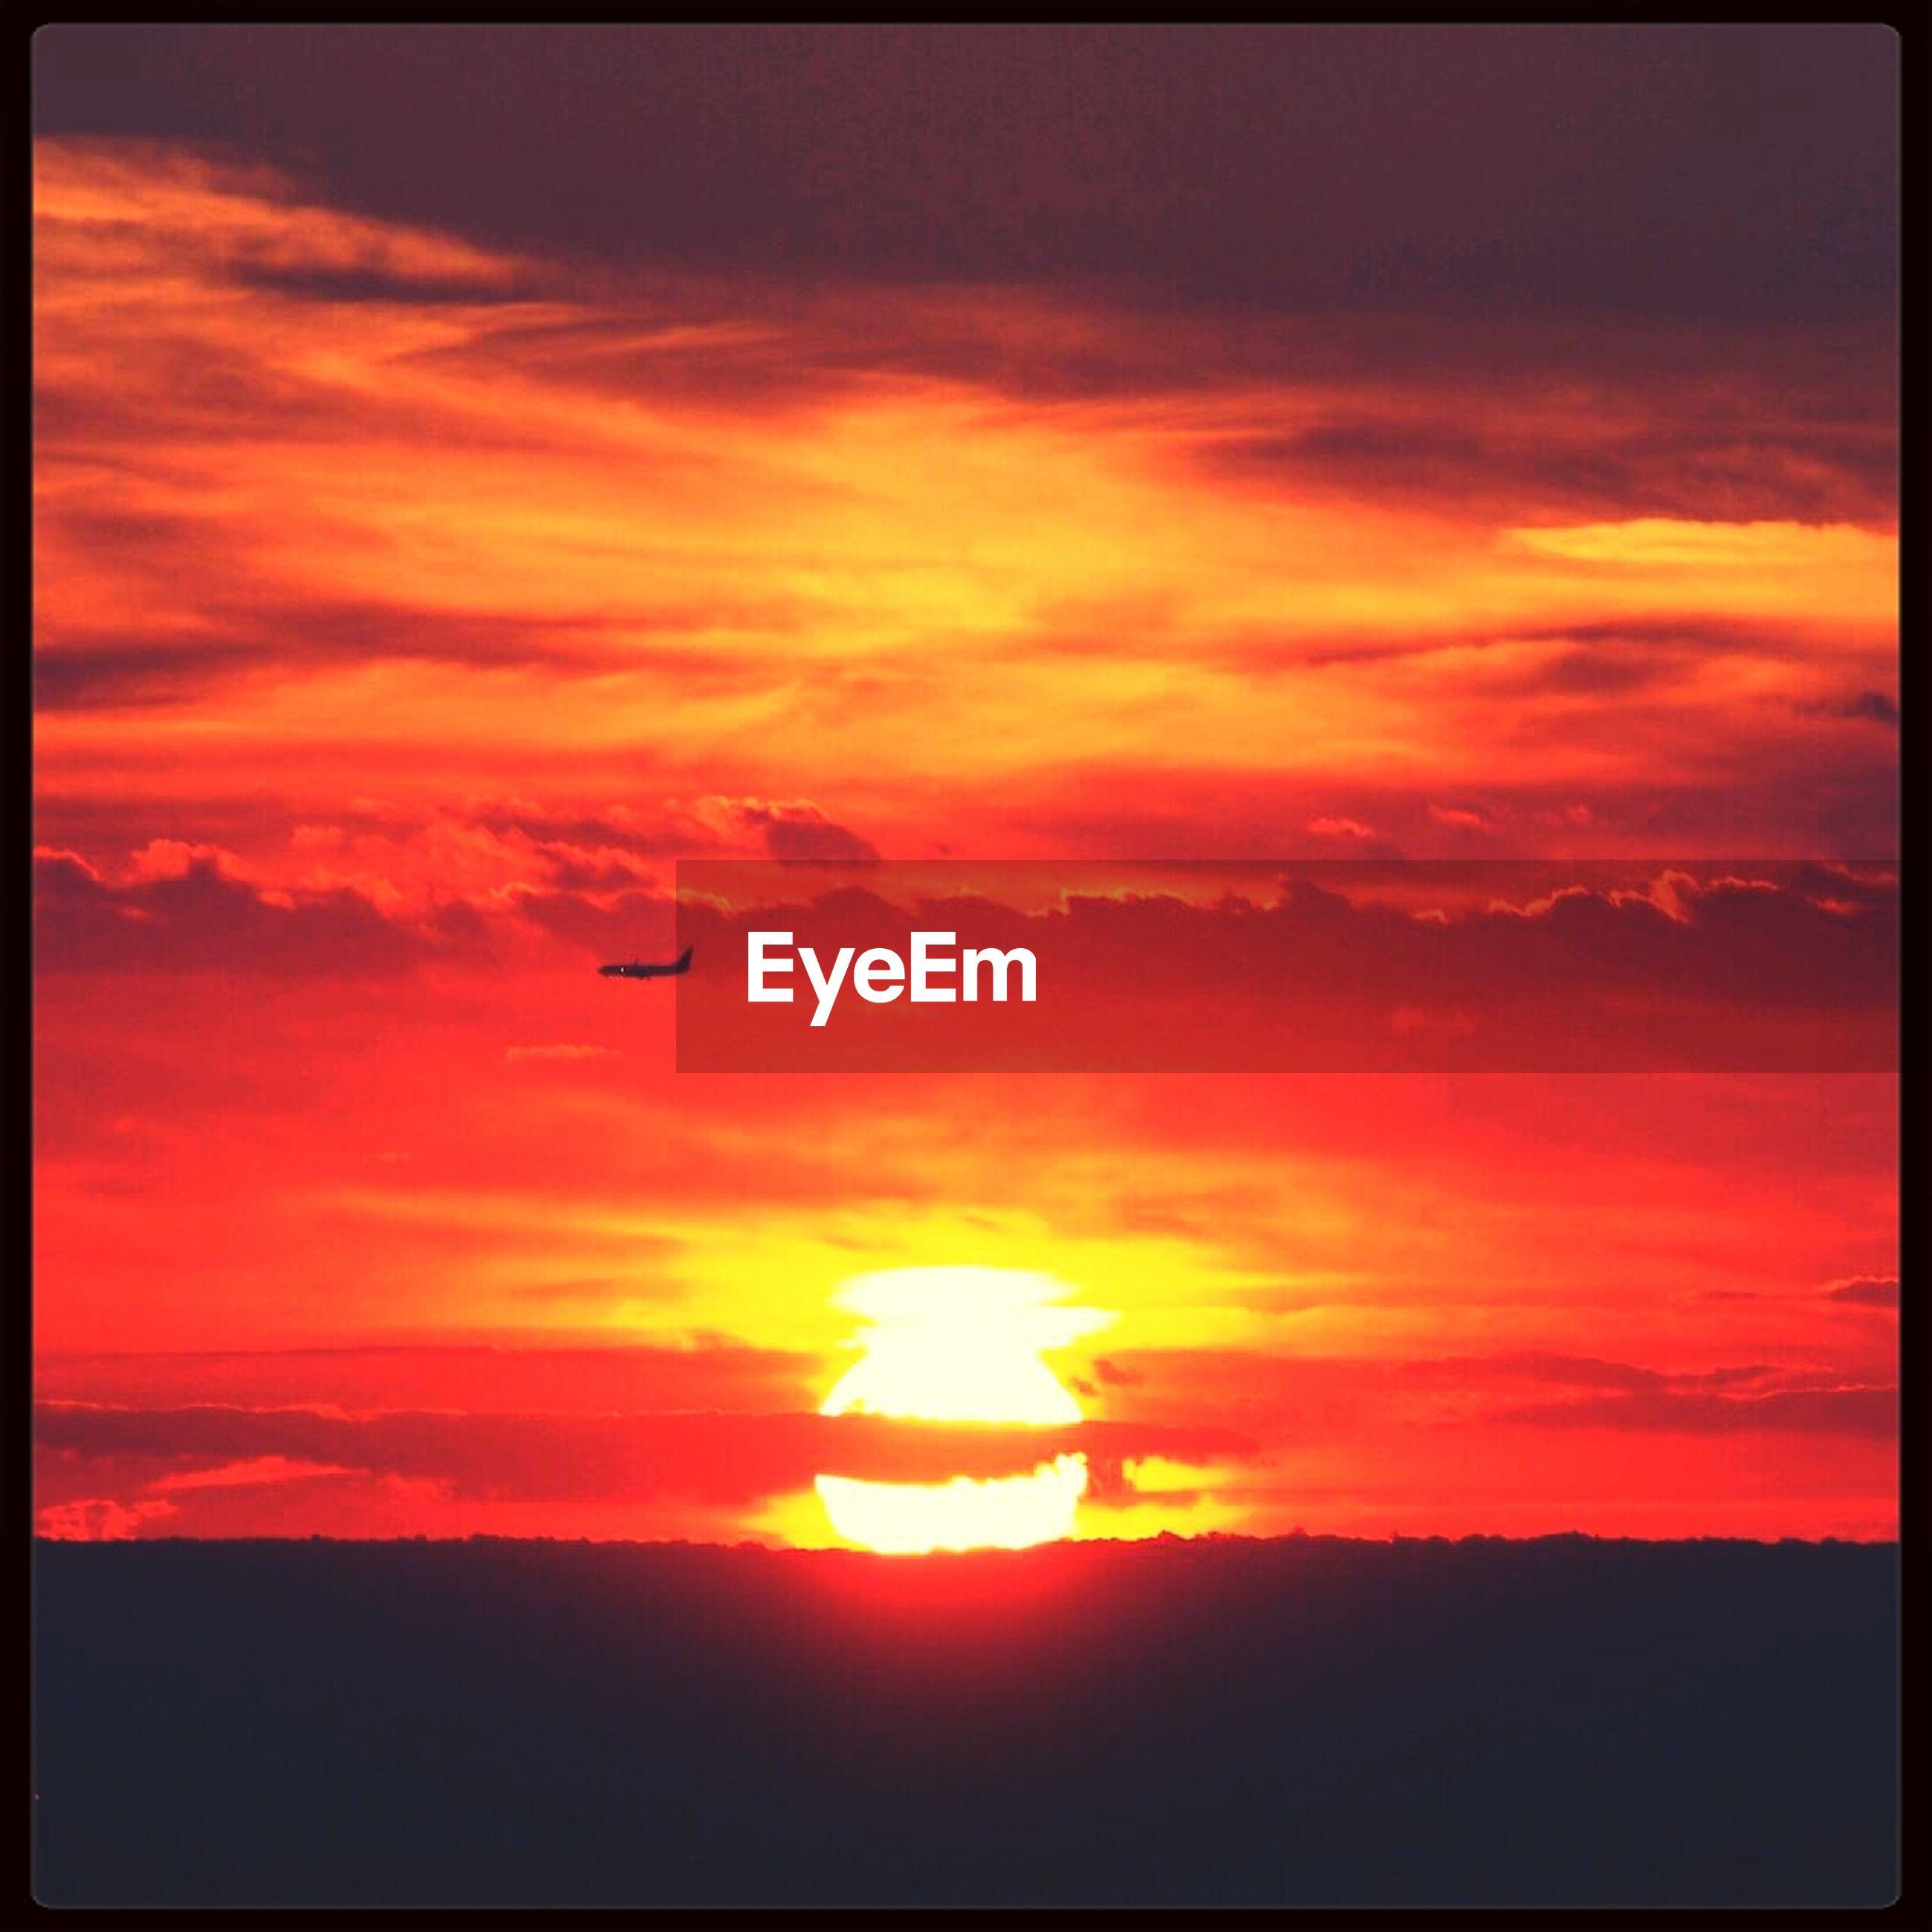 Fiery sunset over silhouette landscape